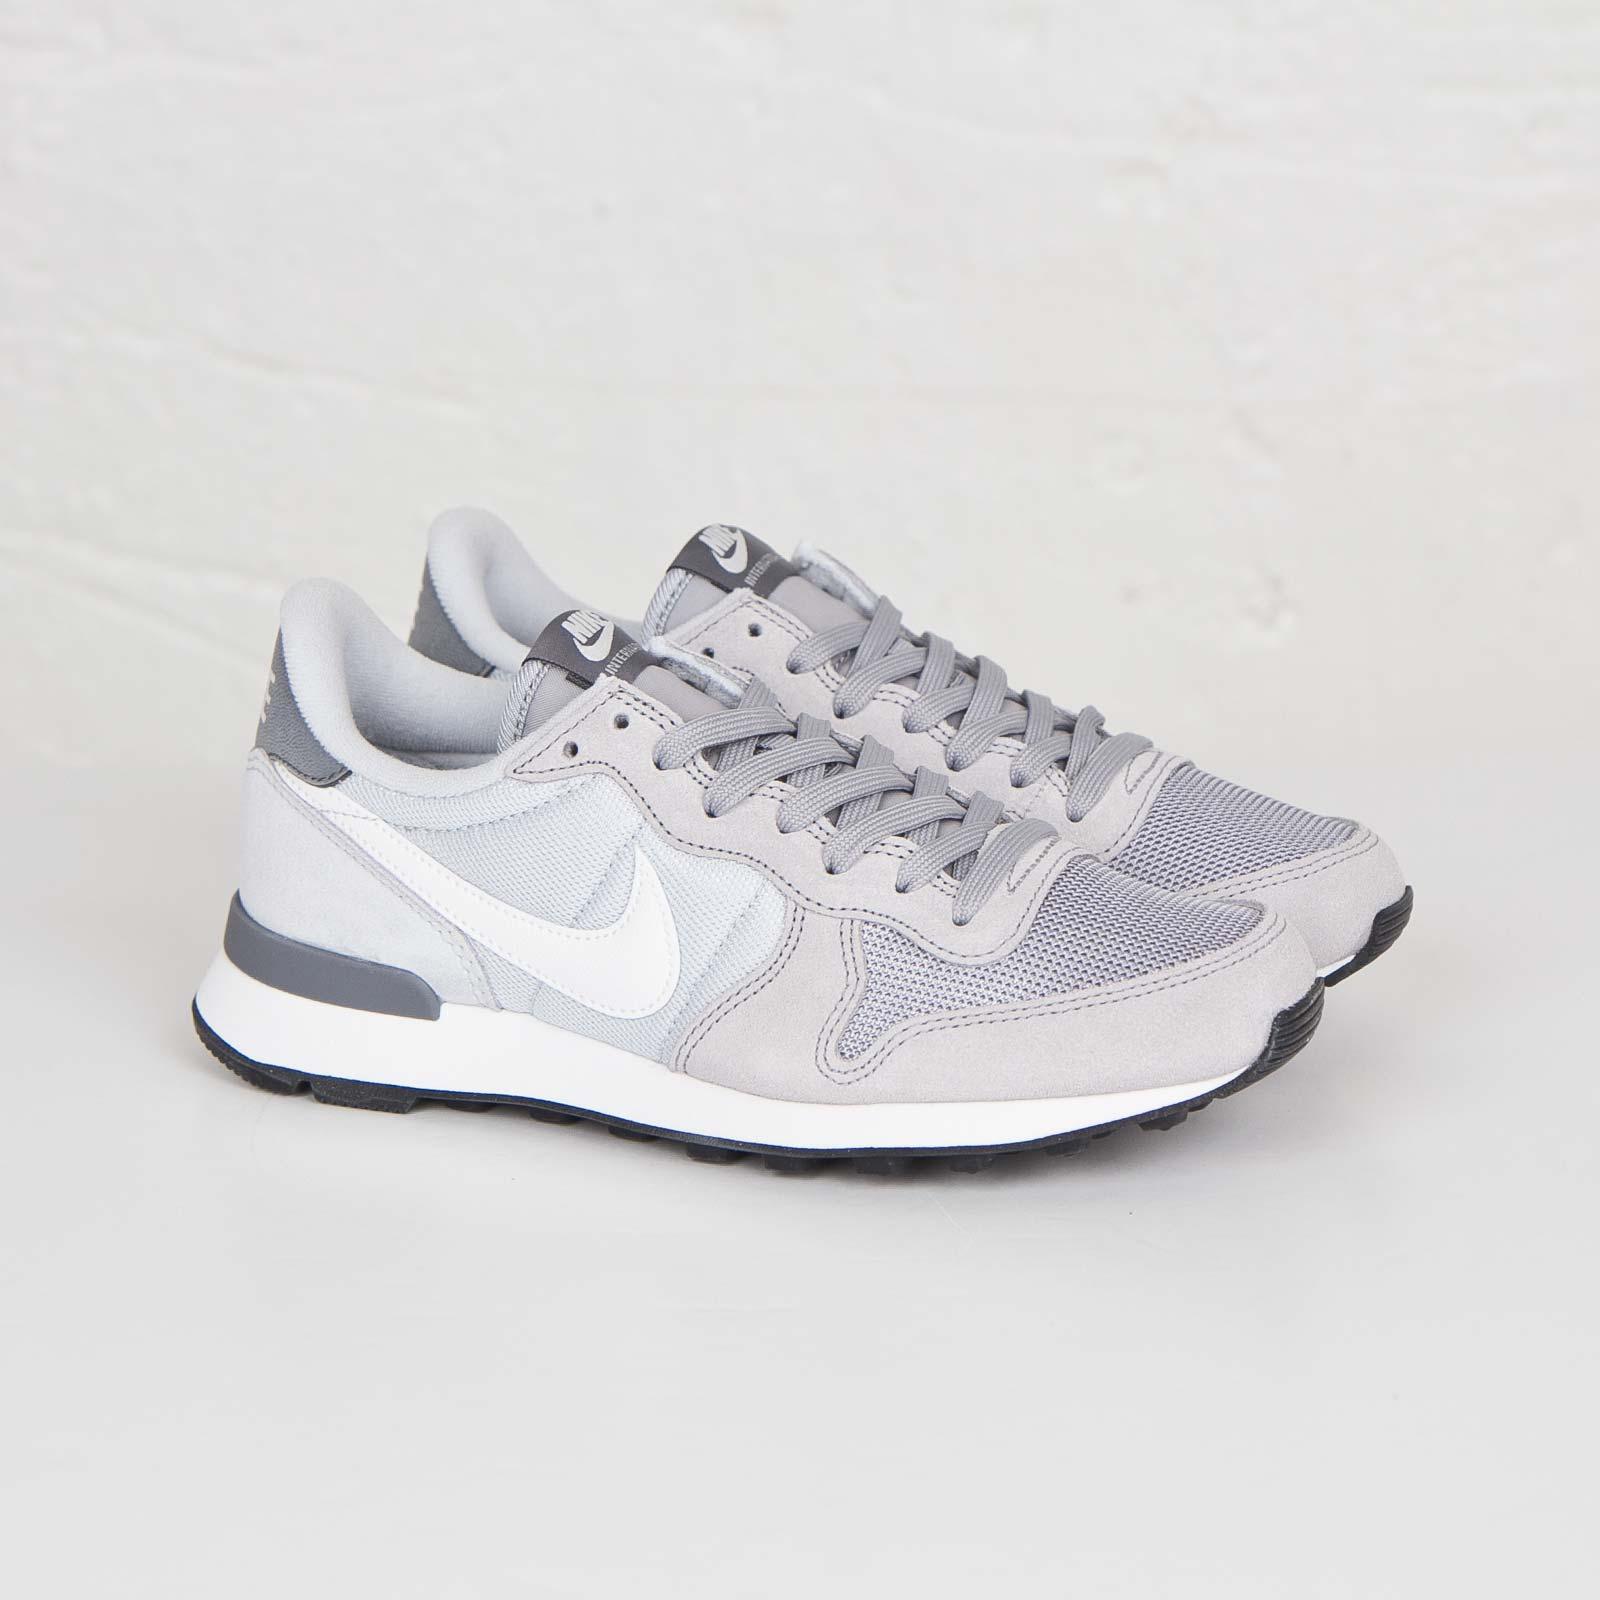 Nike Wmns Internationalist 629684 015 Sneakersnstuff I